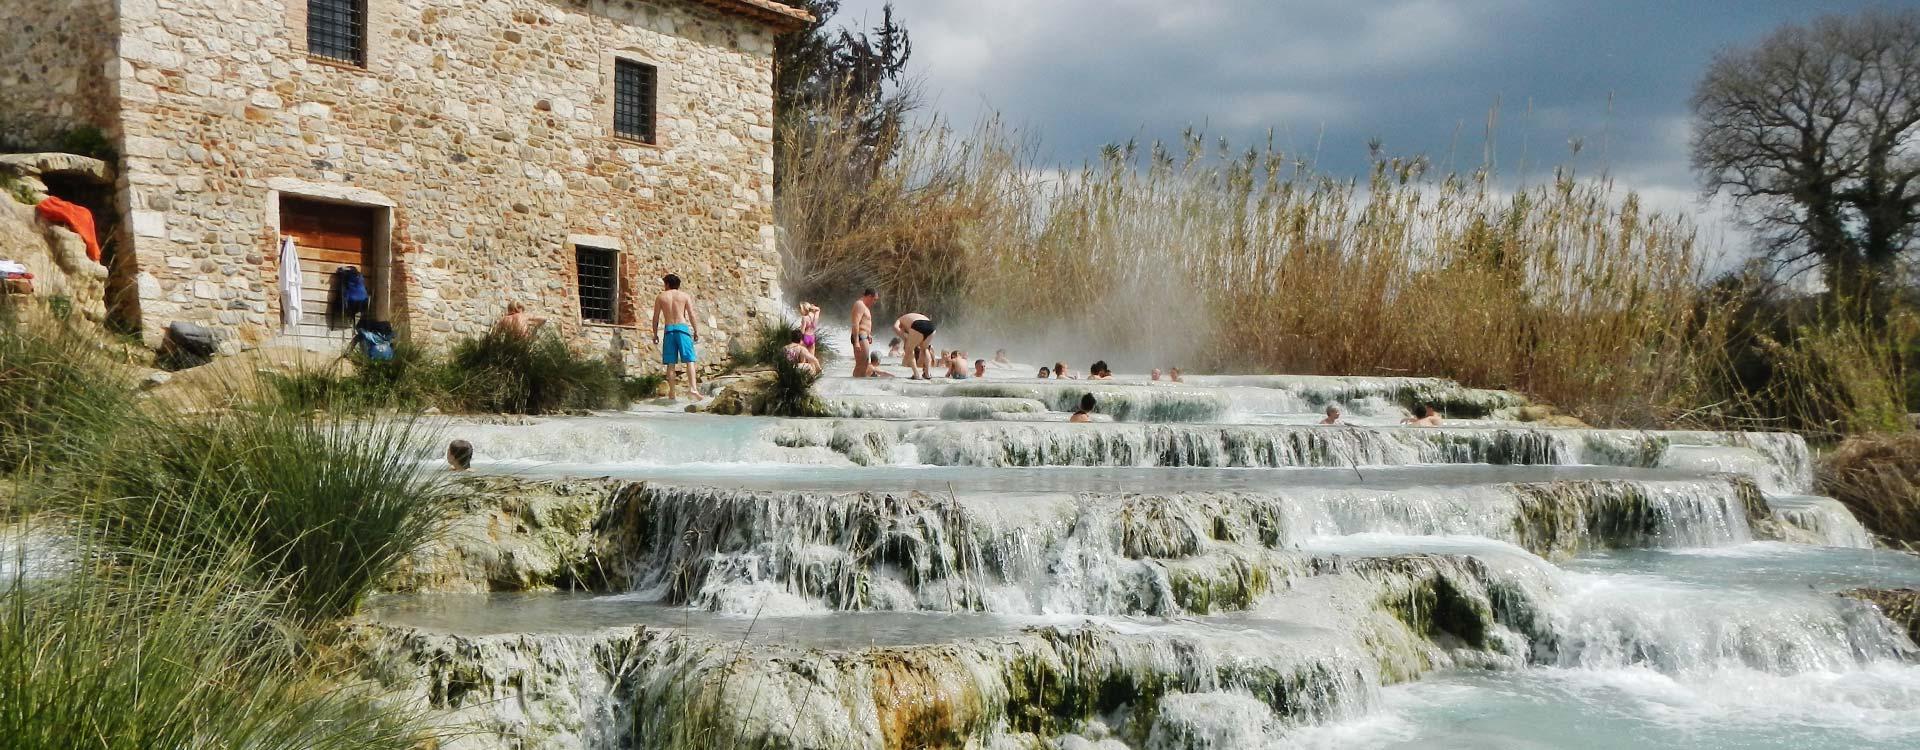 Agriturismo Terme di Saturnia, Toscana: Il Cavallino